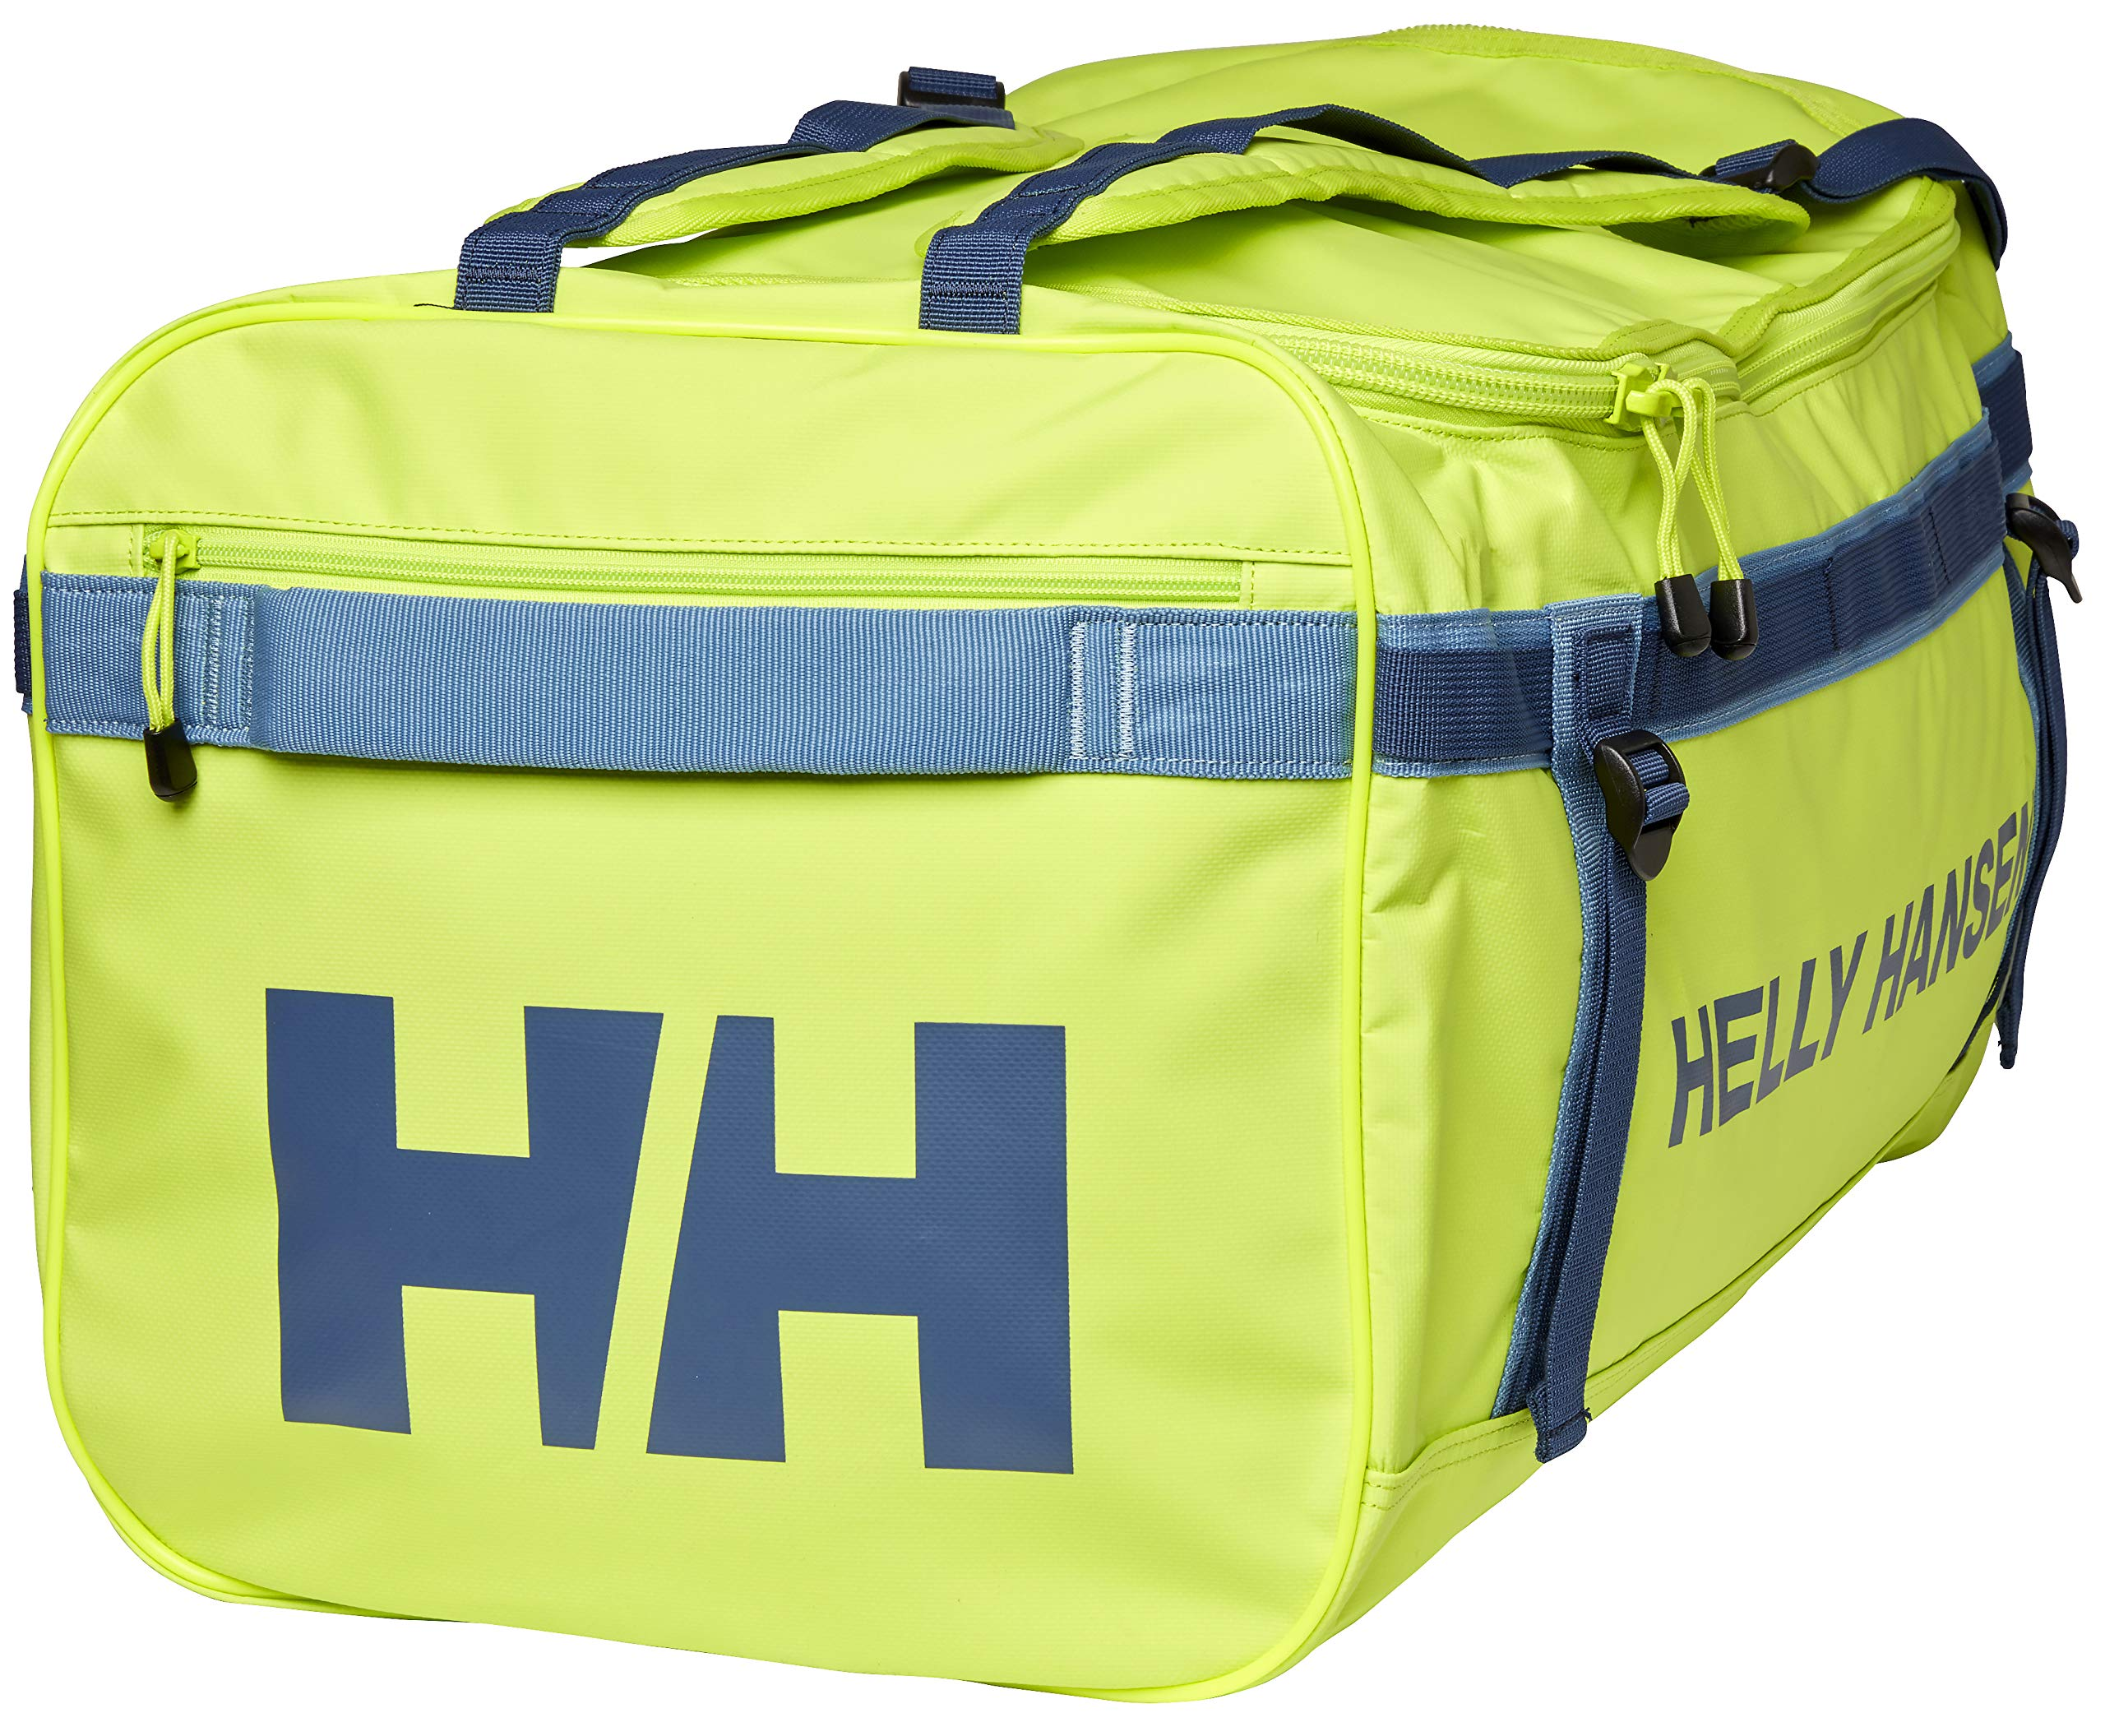 Unisex Adulto Helly Hansen Classic Duffel Bolsa de Viaje Impermeable Deporte